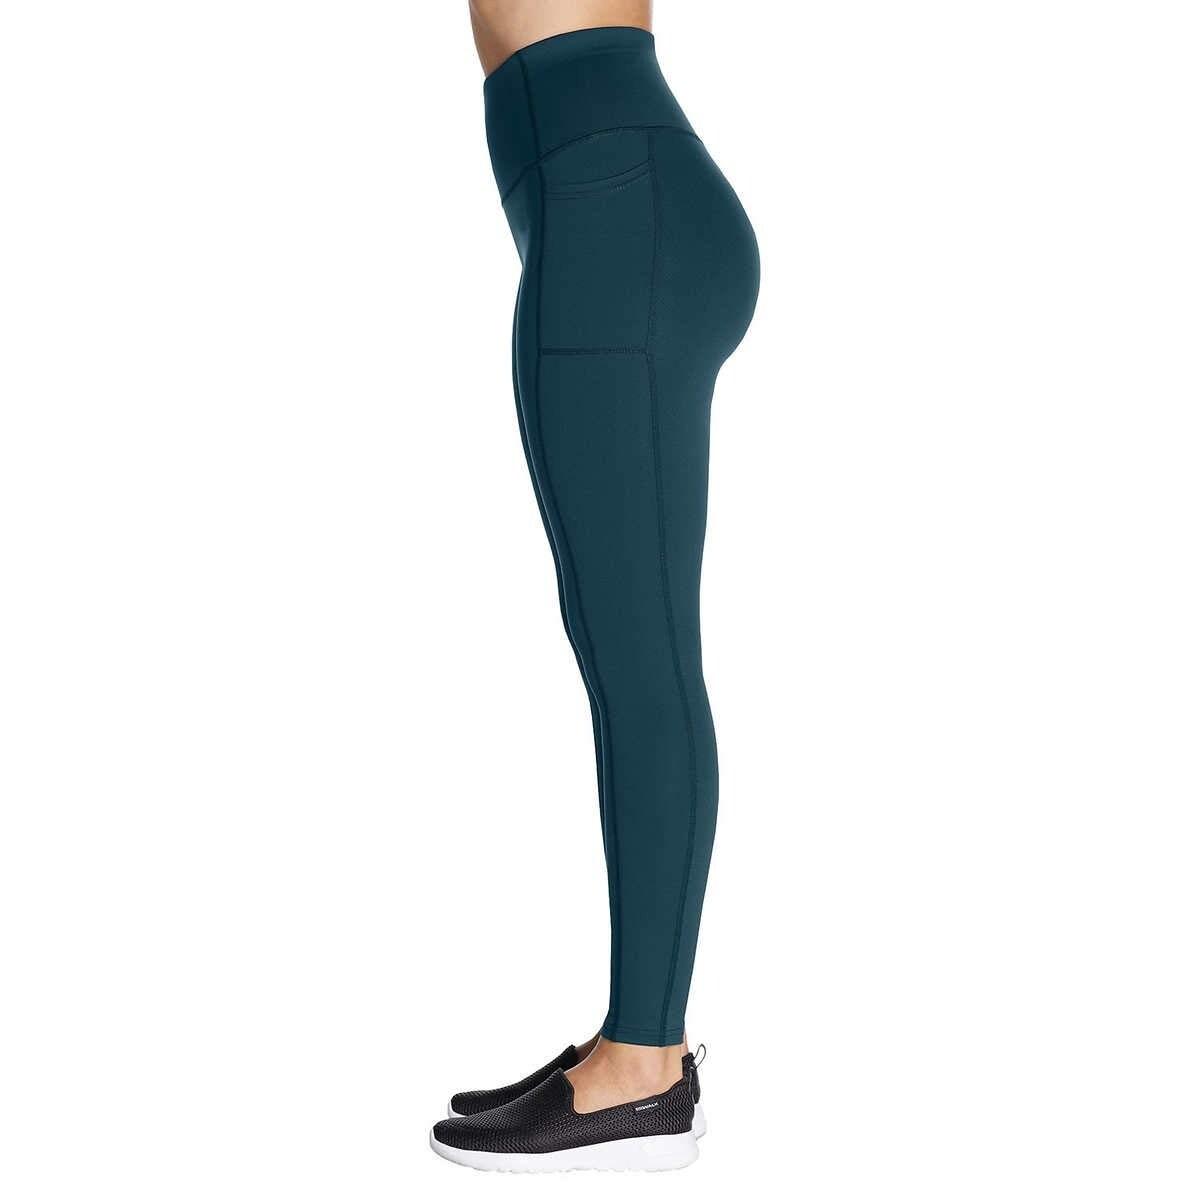 Skechers Womens Walk Go Flex High Waisted 2-Pocket Yoga Legging